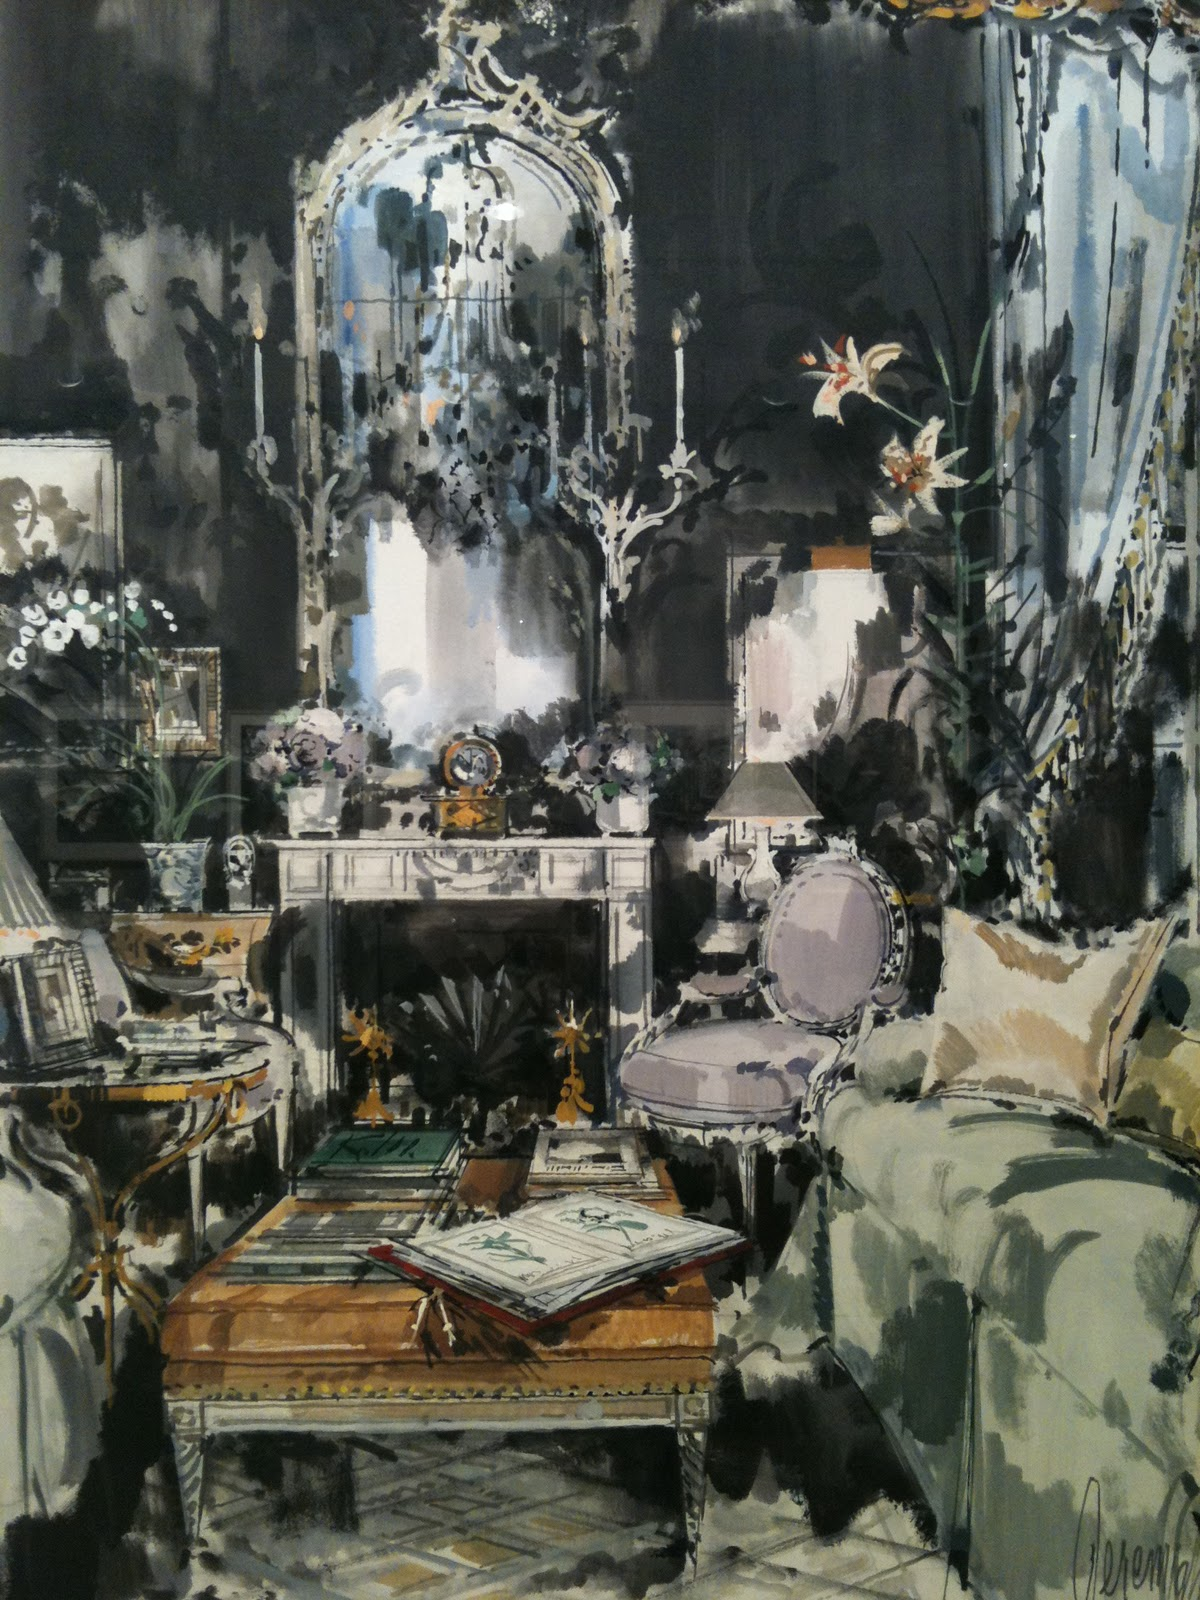 David Hicks's living room